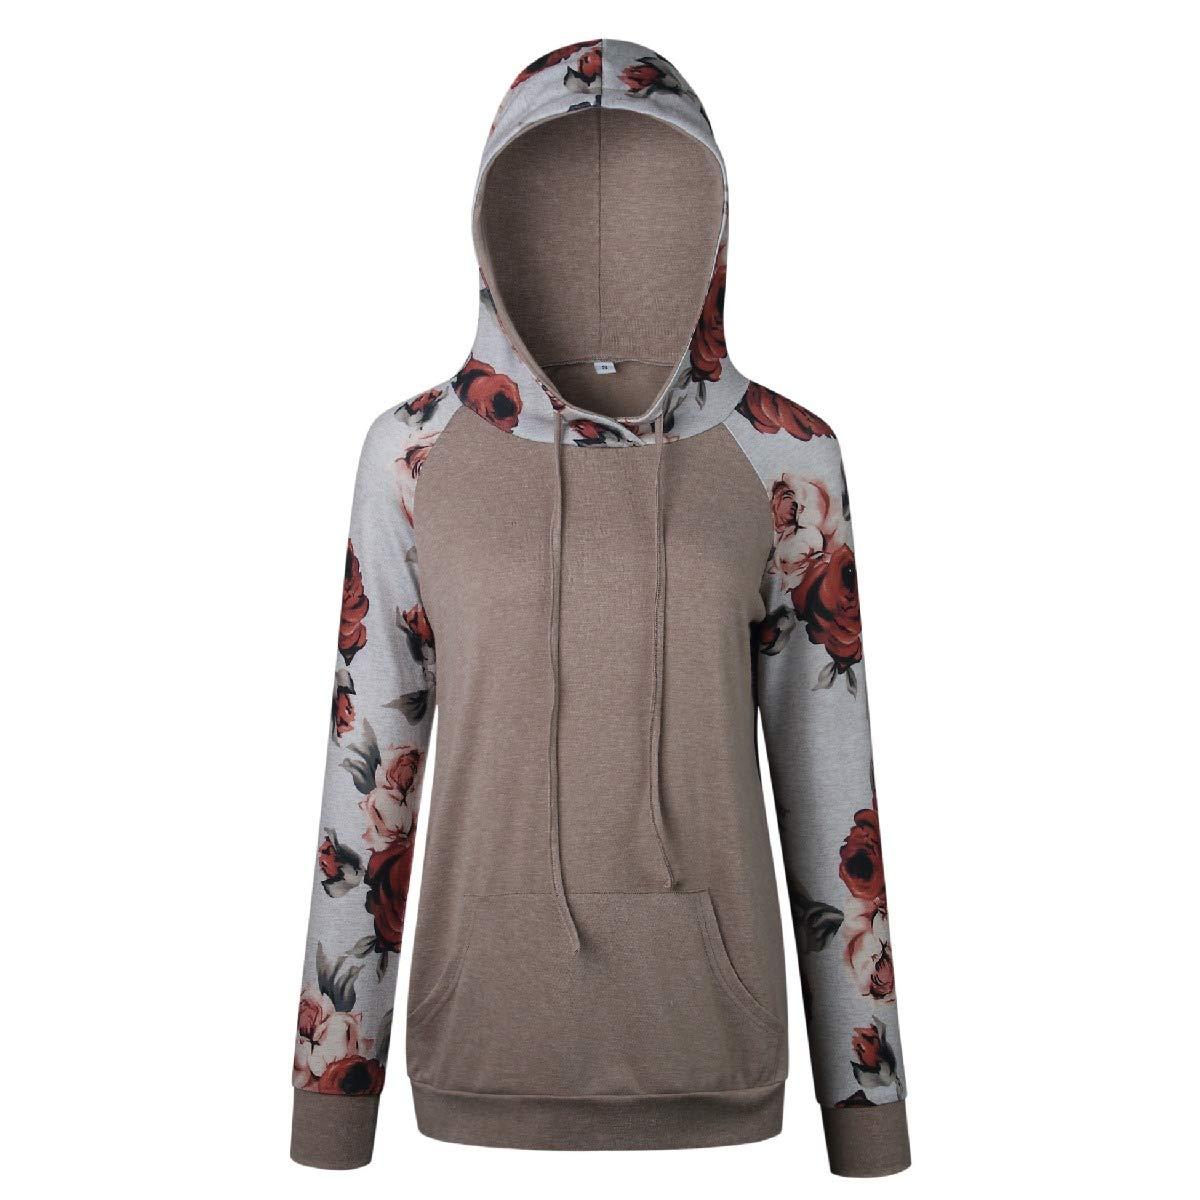 Comaba Womens Loose Pockets Floral Printed Hoodie Pullover Top Sweatshirt